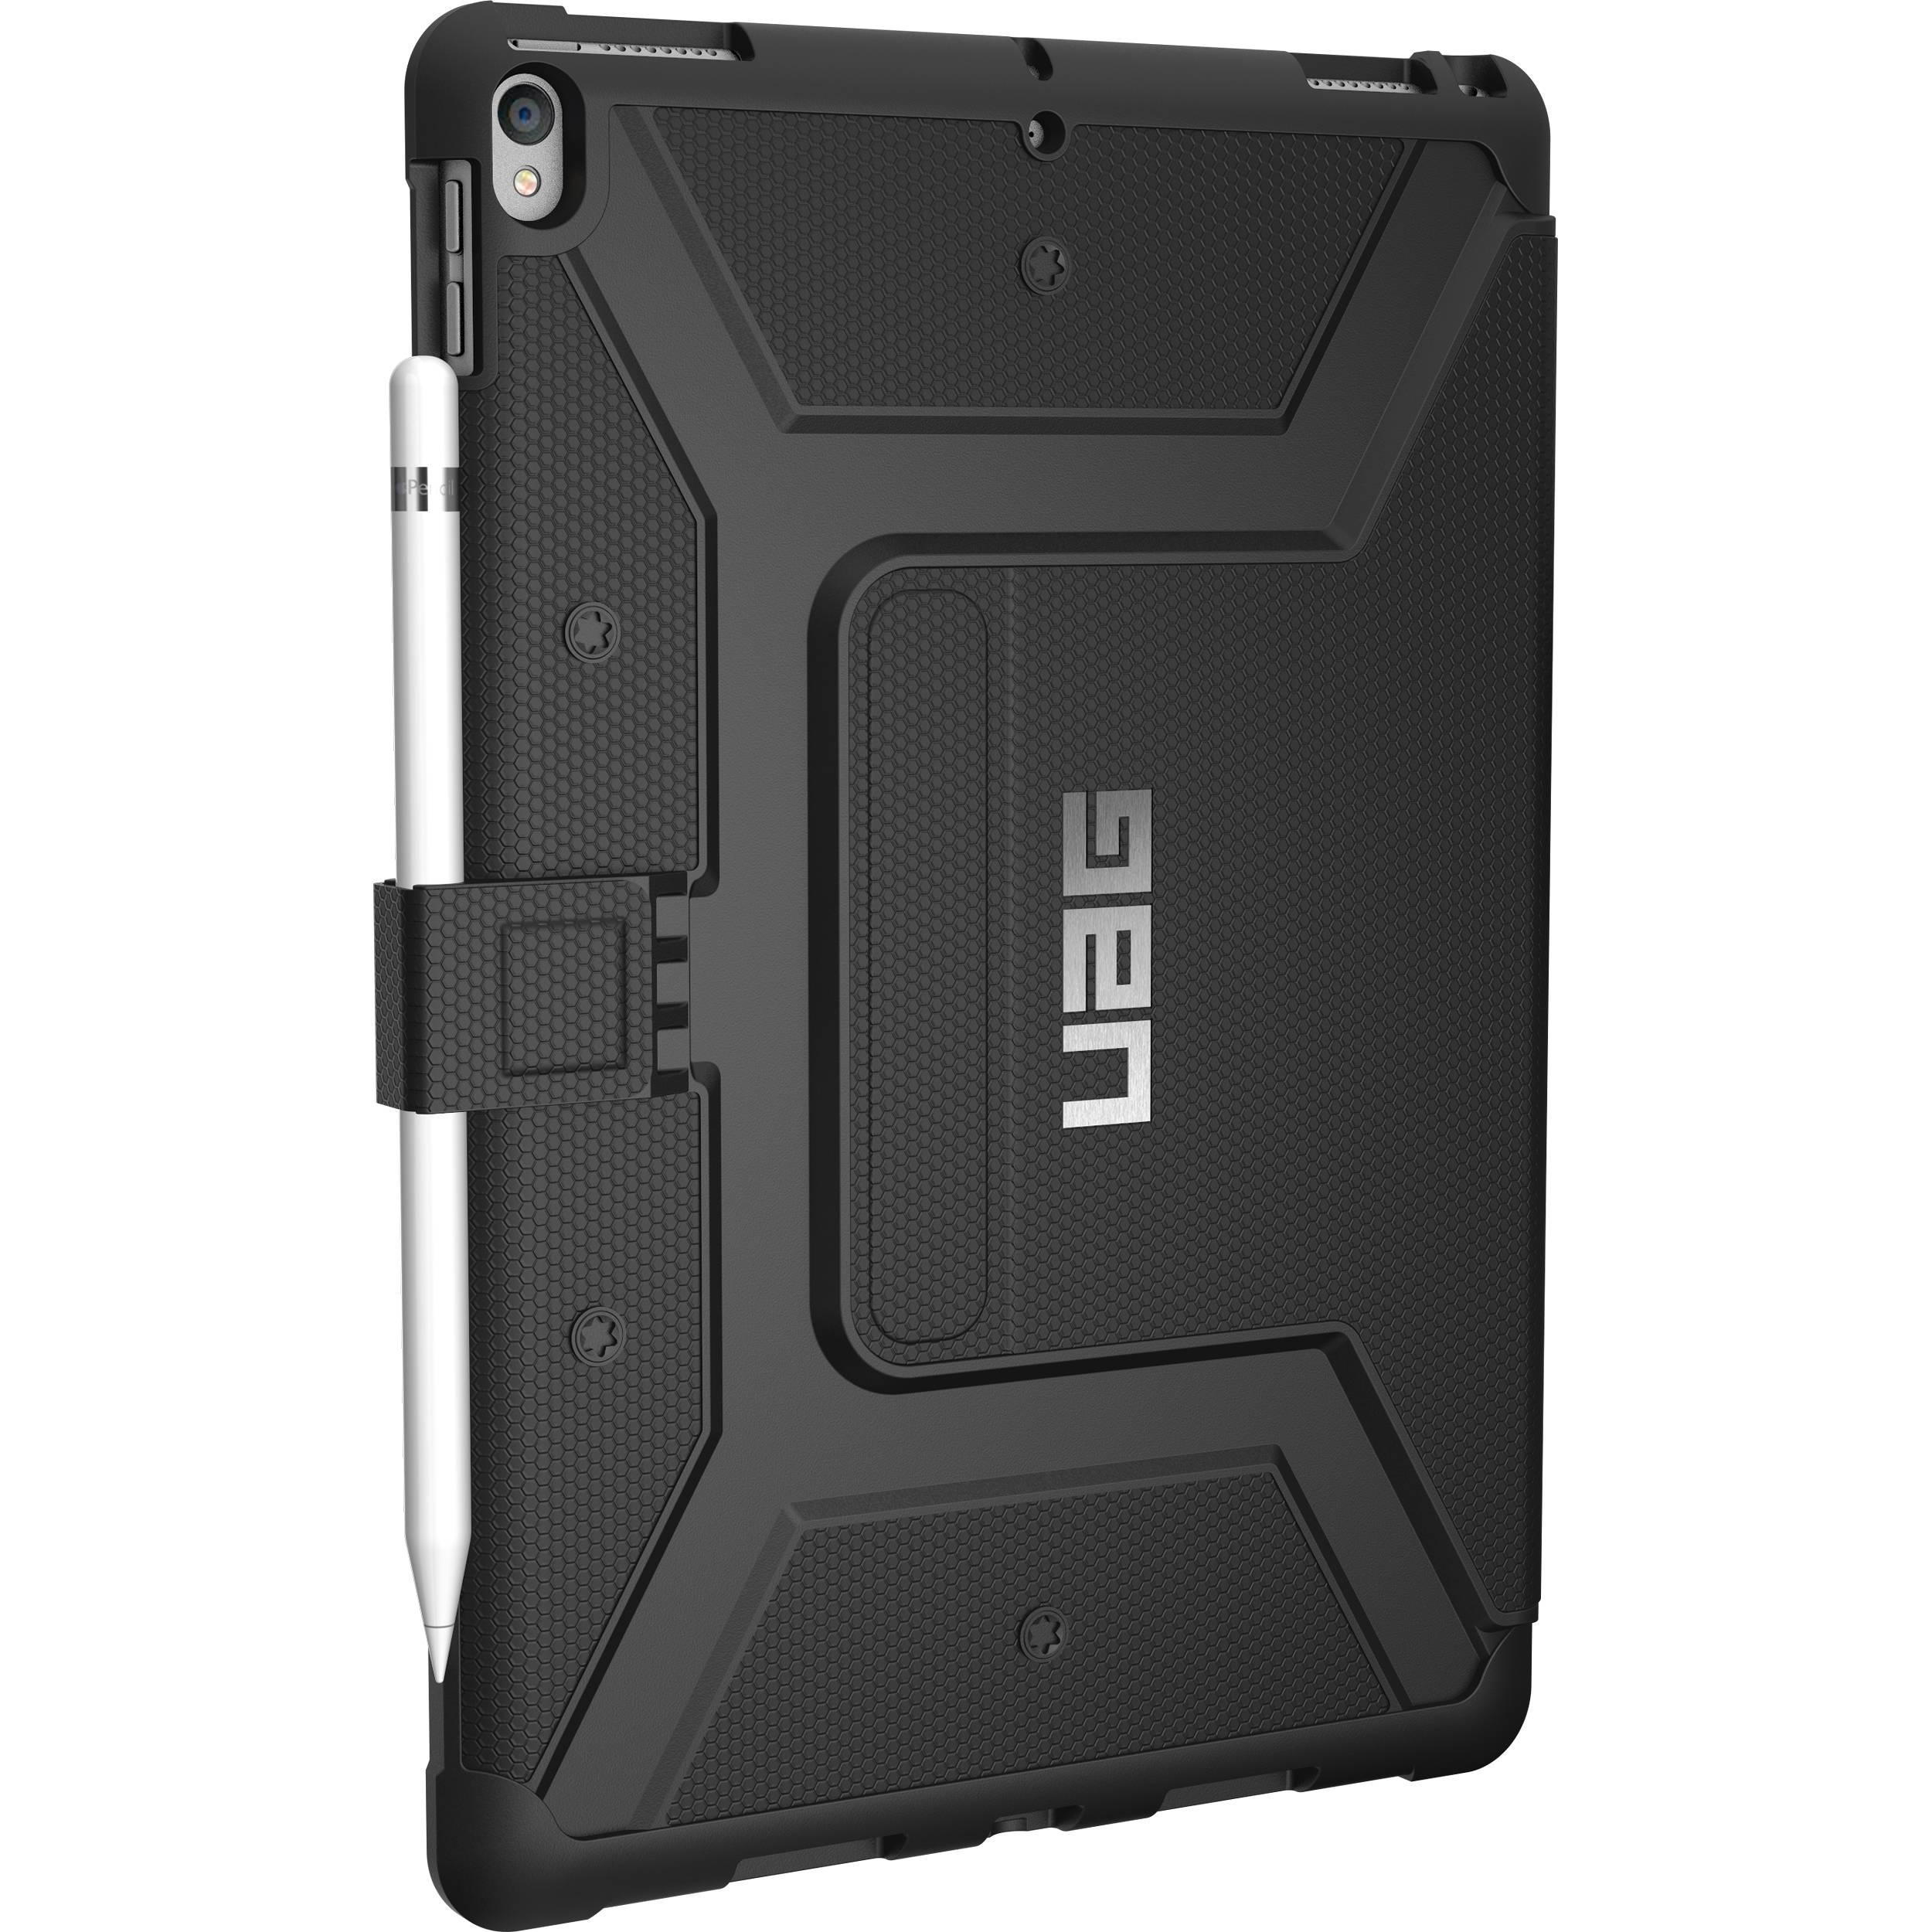 online retailer 8f544 b5eed Urban Armor Gear Metropolis Case for iPad Pro 10.5